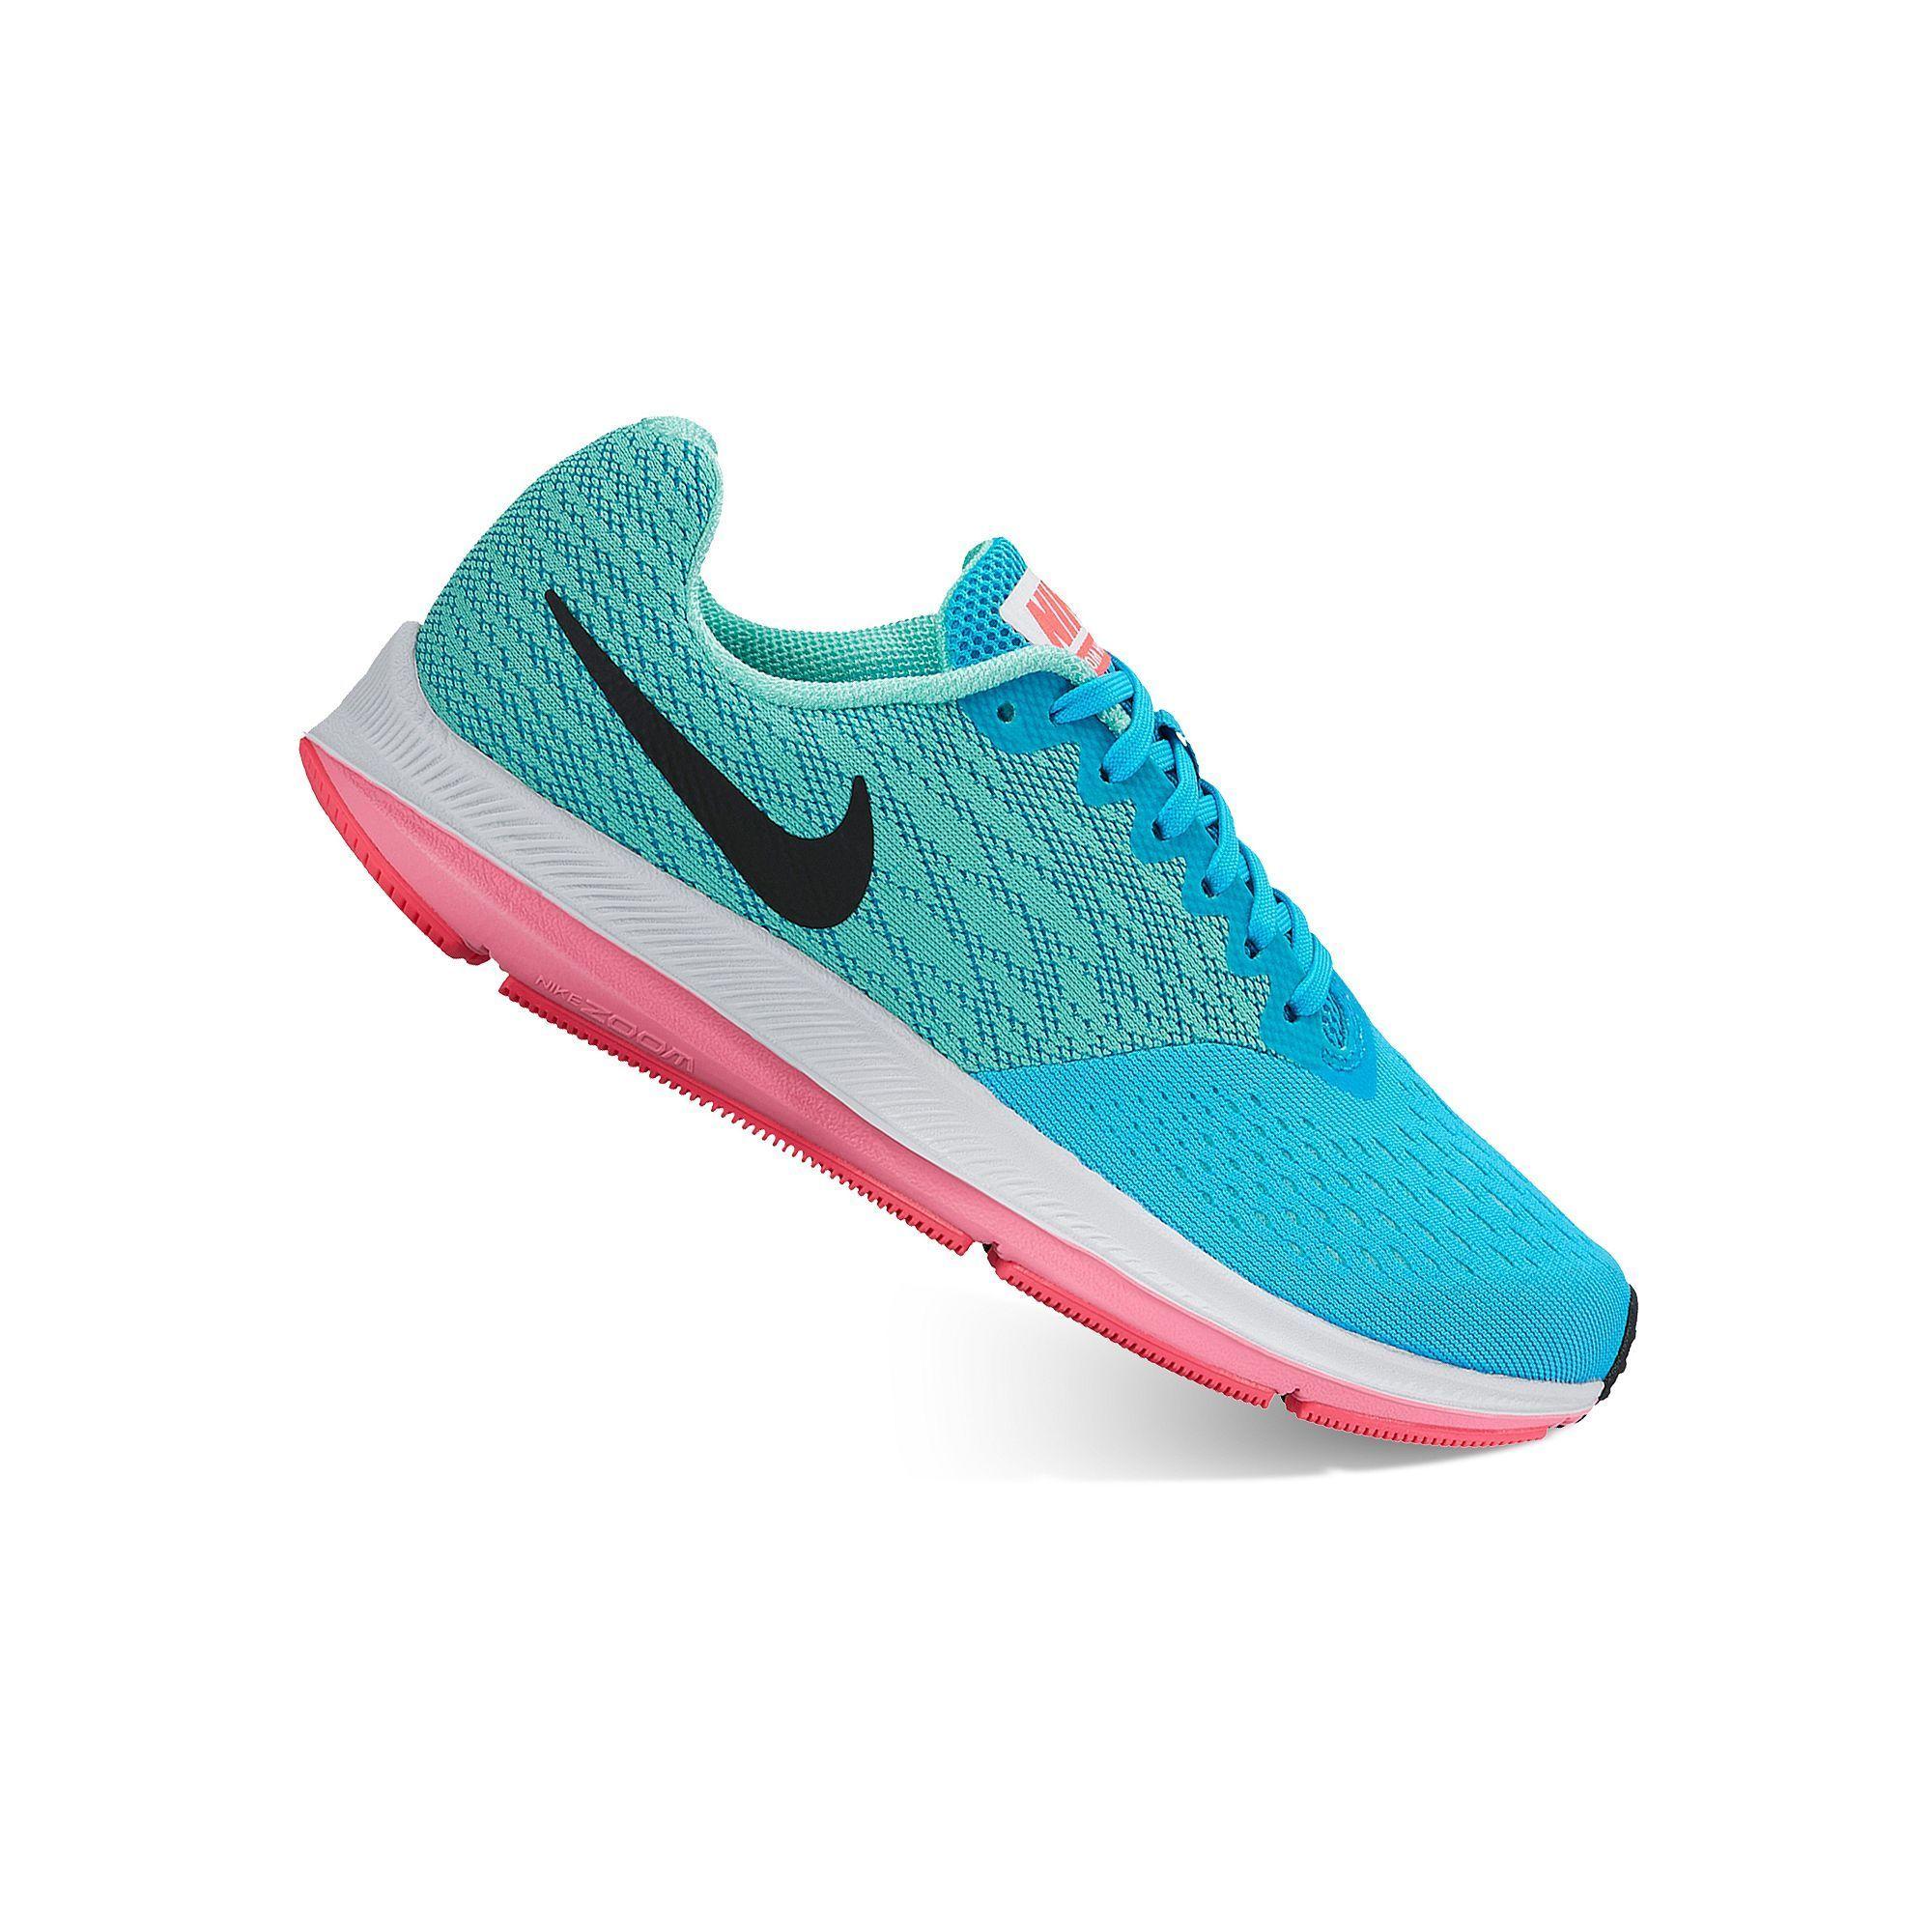 san francisco d77c7 6bfd0 Nike Zoom Winflo 4 Grade School Girls' Running Shoes ...